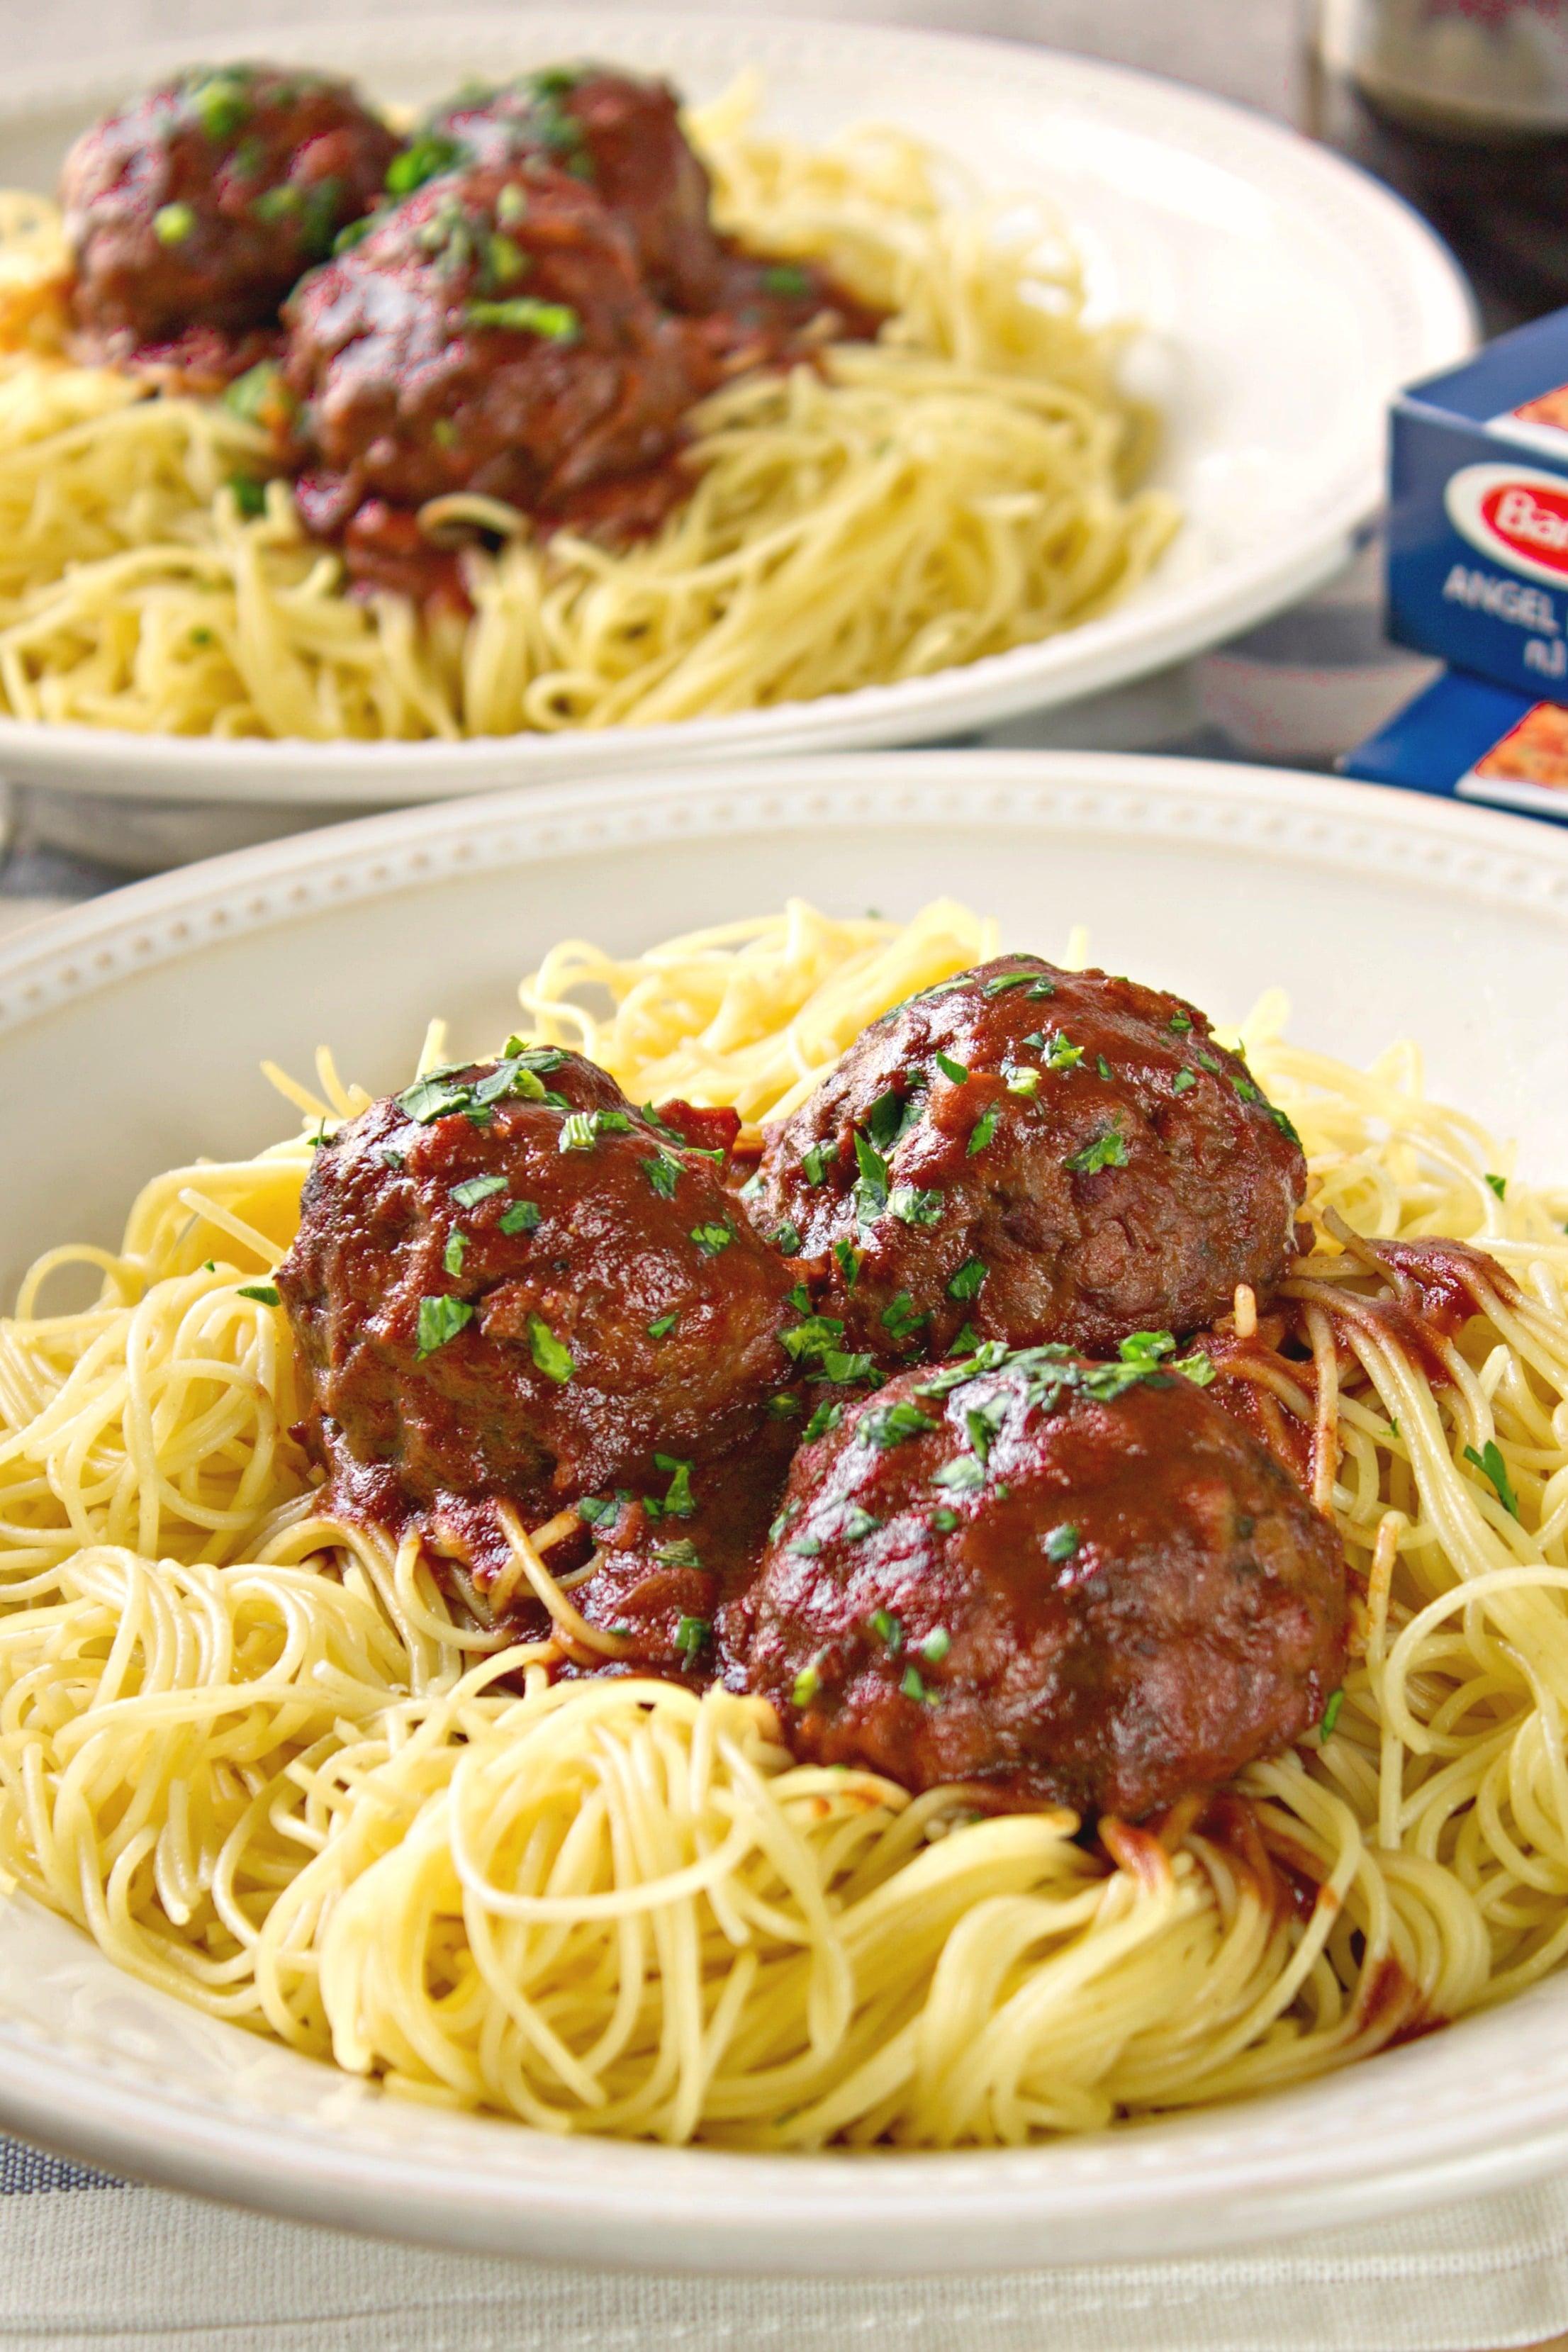 drunken spaghetti and meatballs